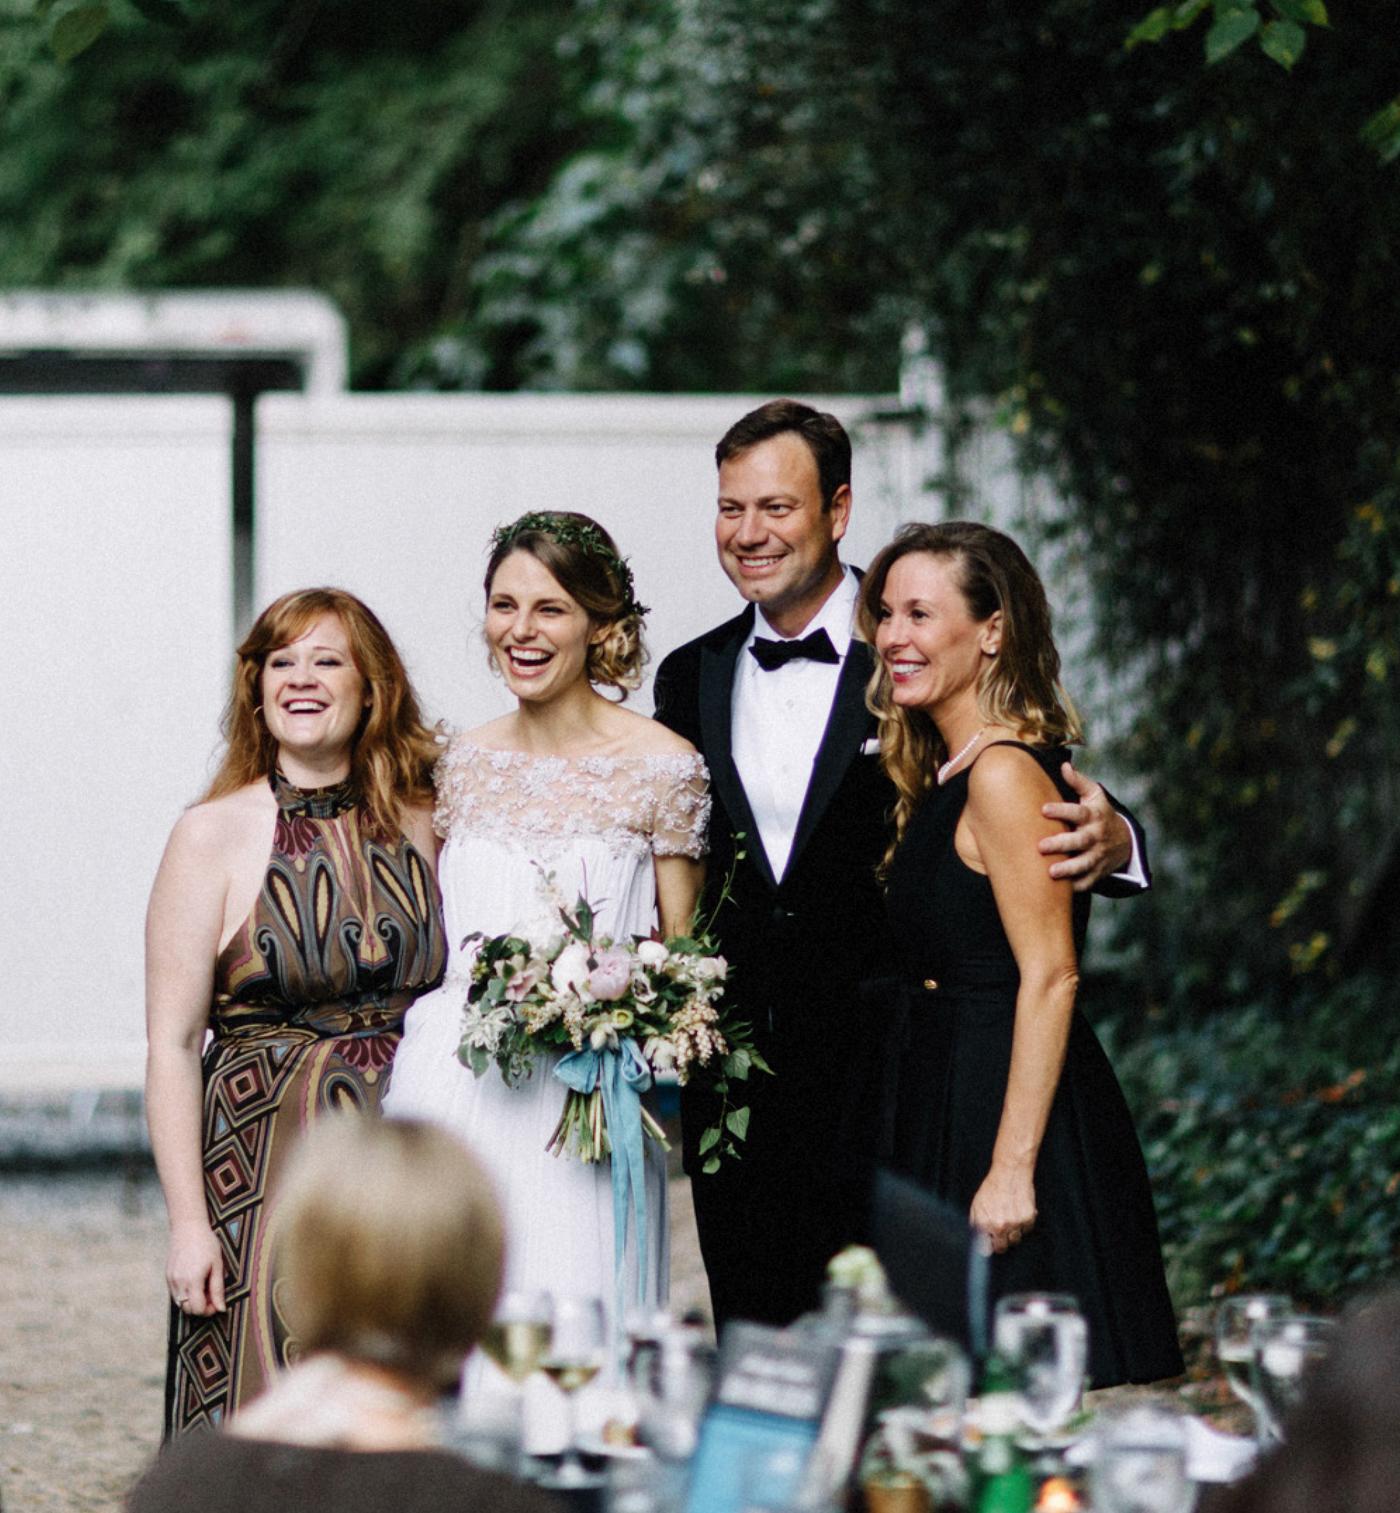 Hunt-Ralston-Wedding---Photo-Courtesy-The-Hons-Photography.jpg